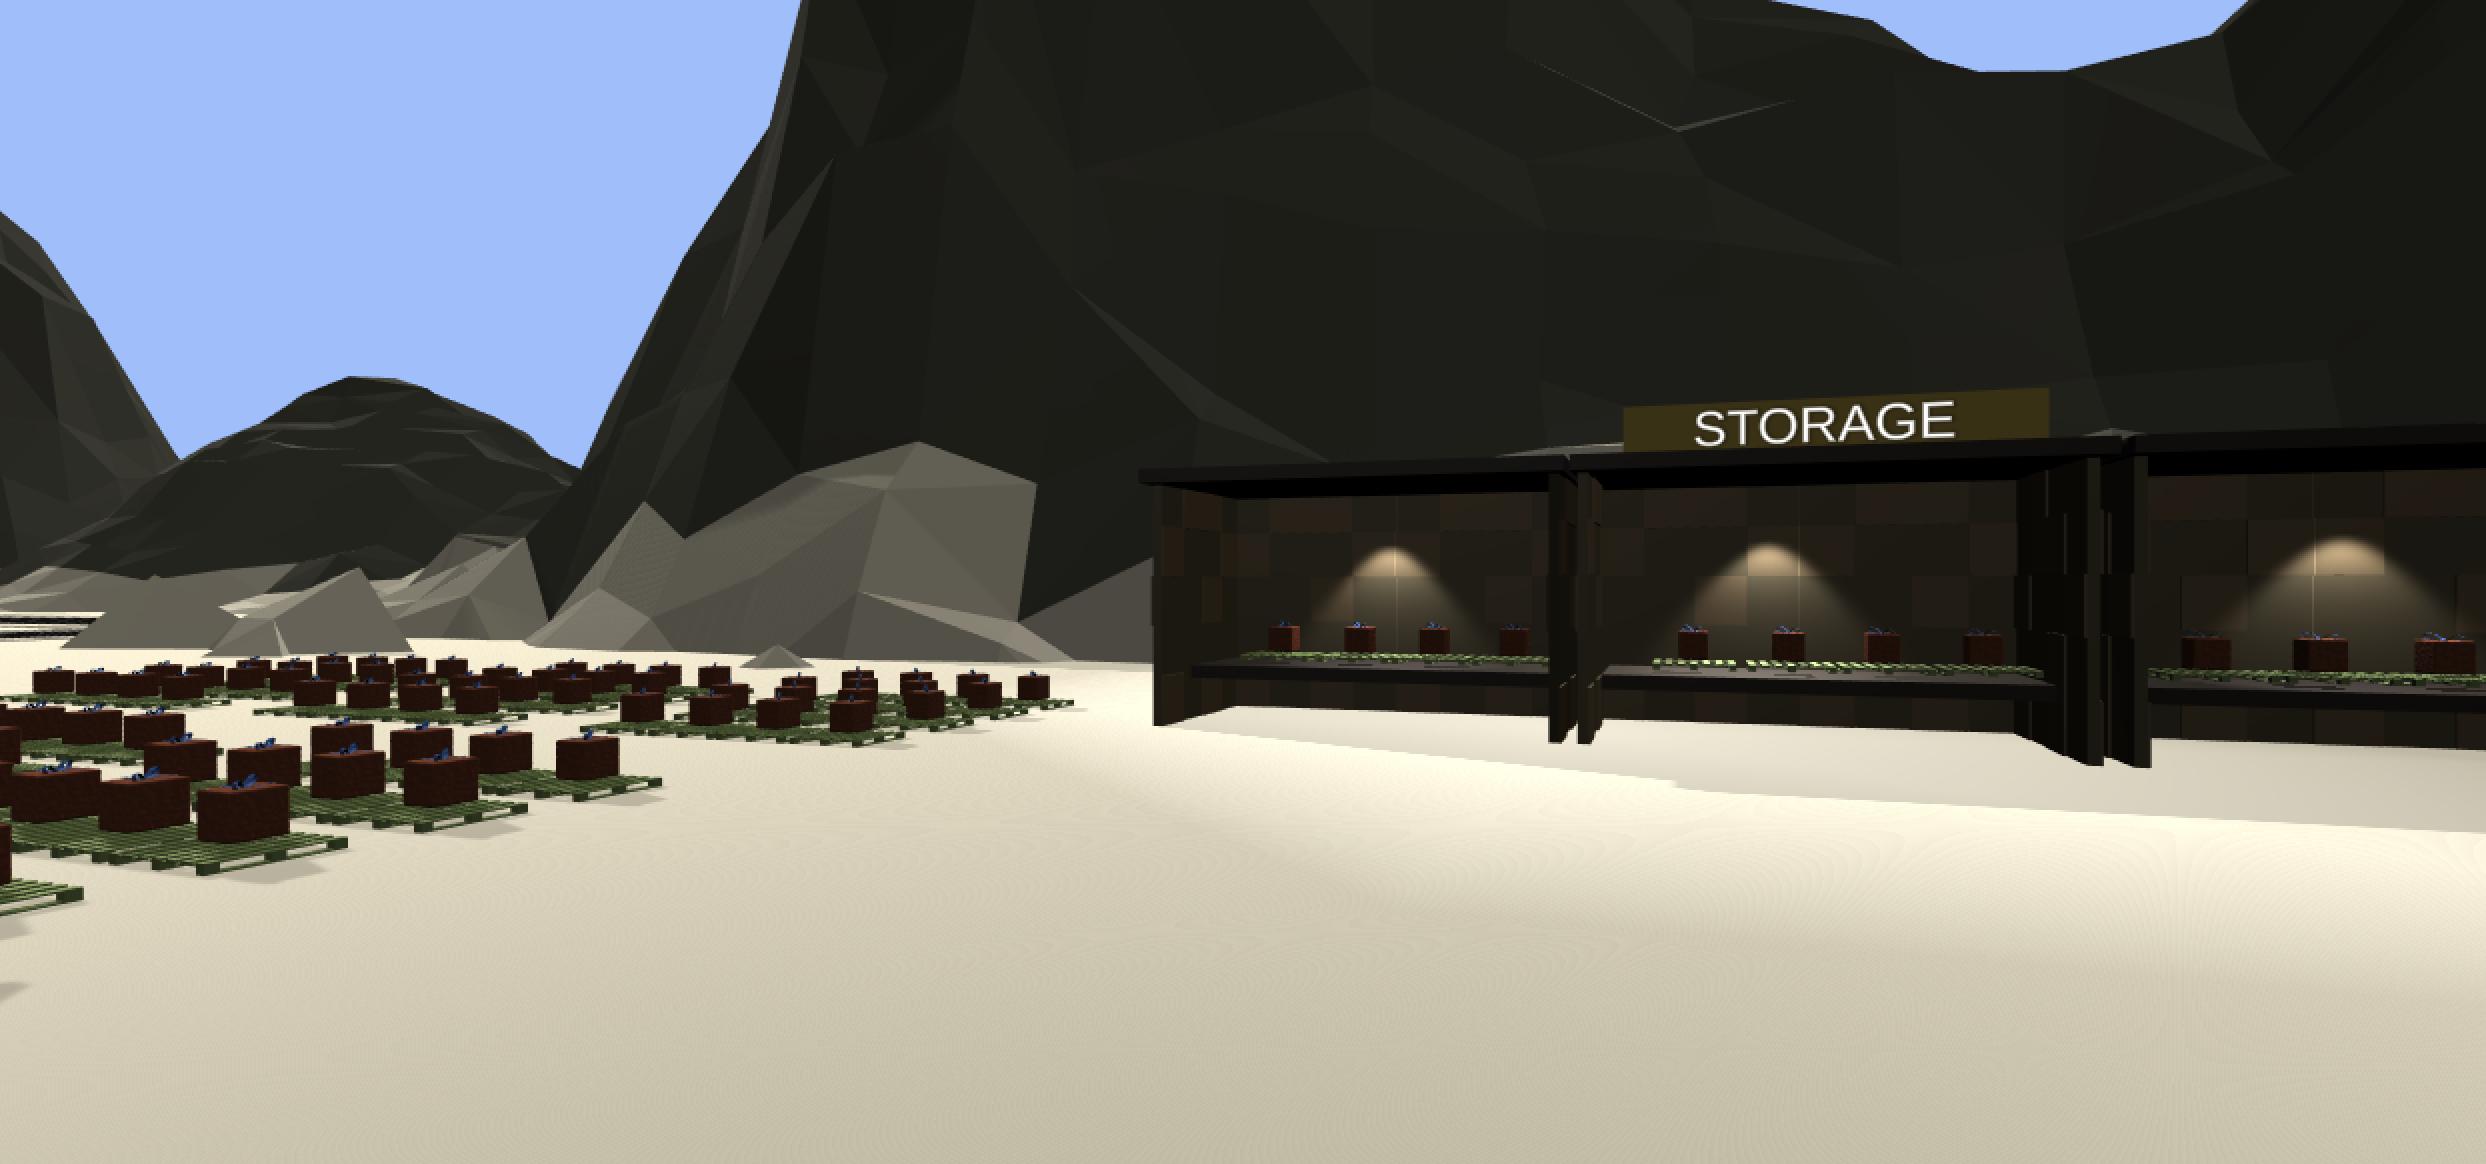 Santa's storage